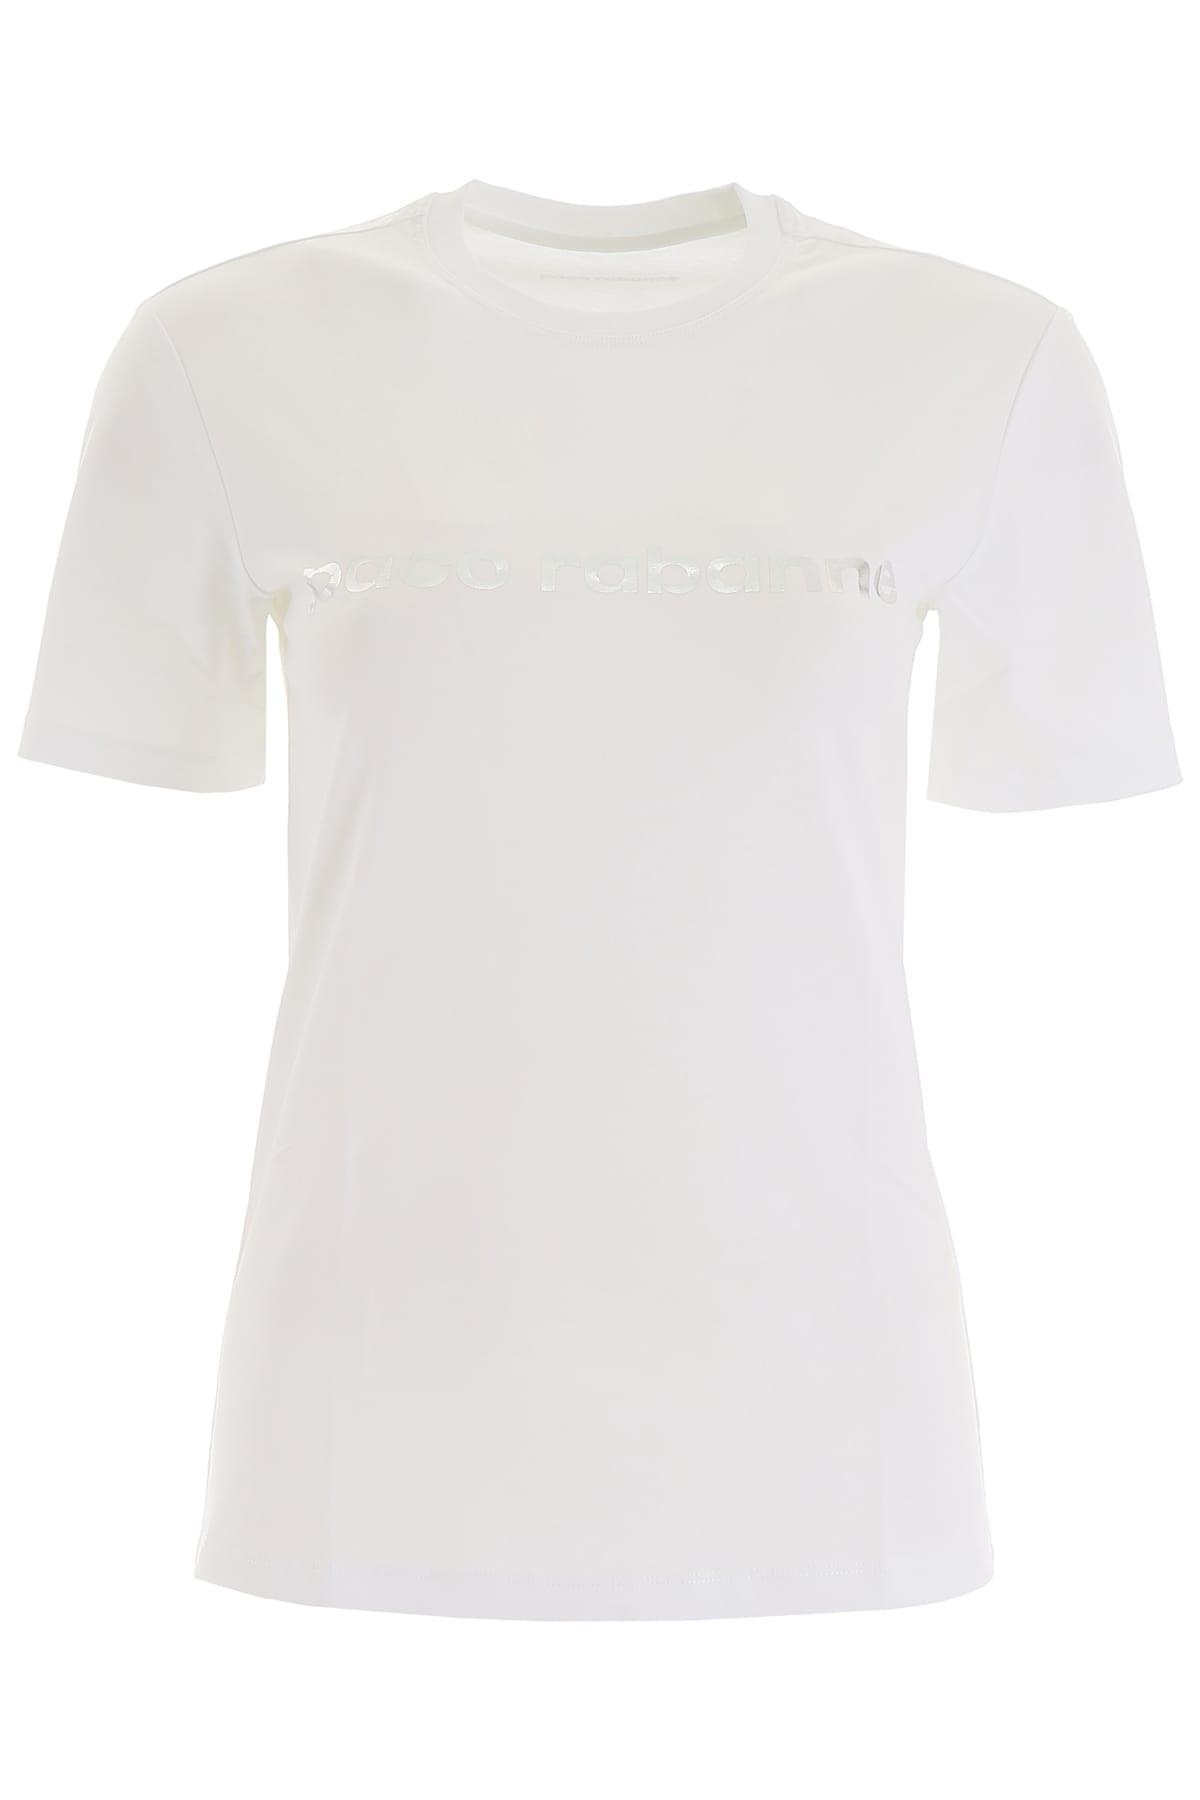 Paco Rabanne Logo T-shirt